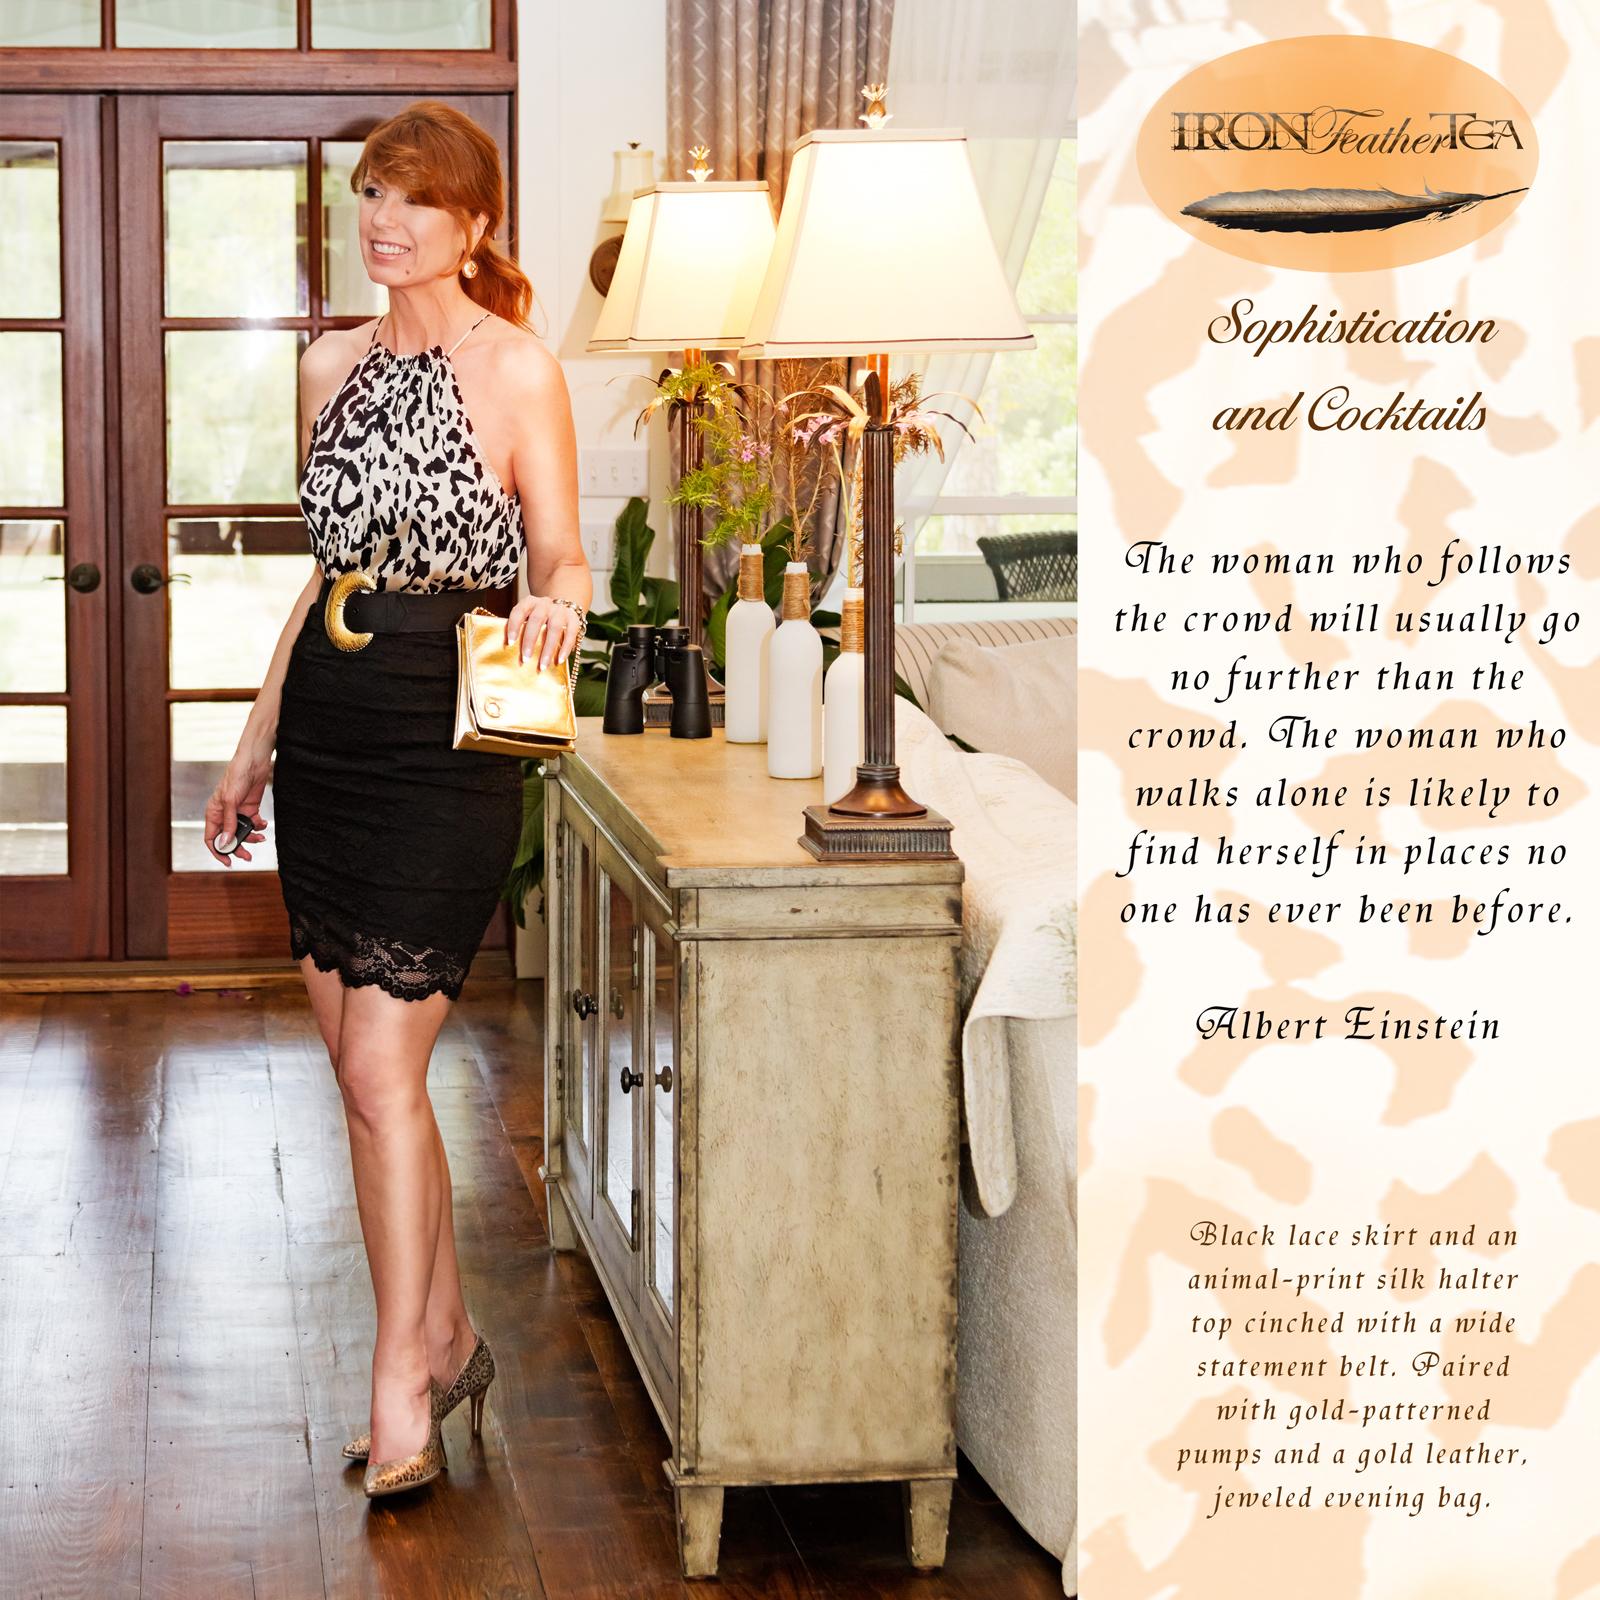 Nan Mac models a black lace skirt and silk halter top.